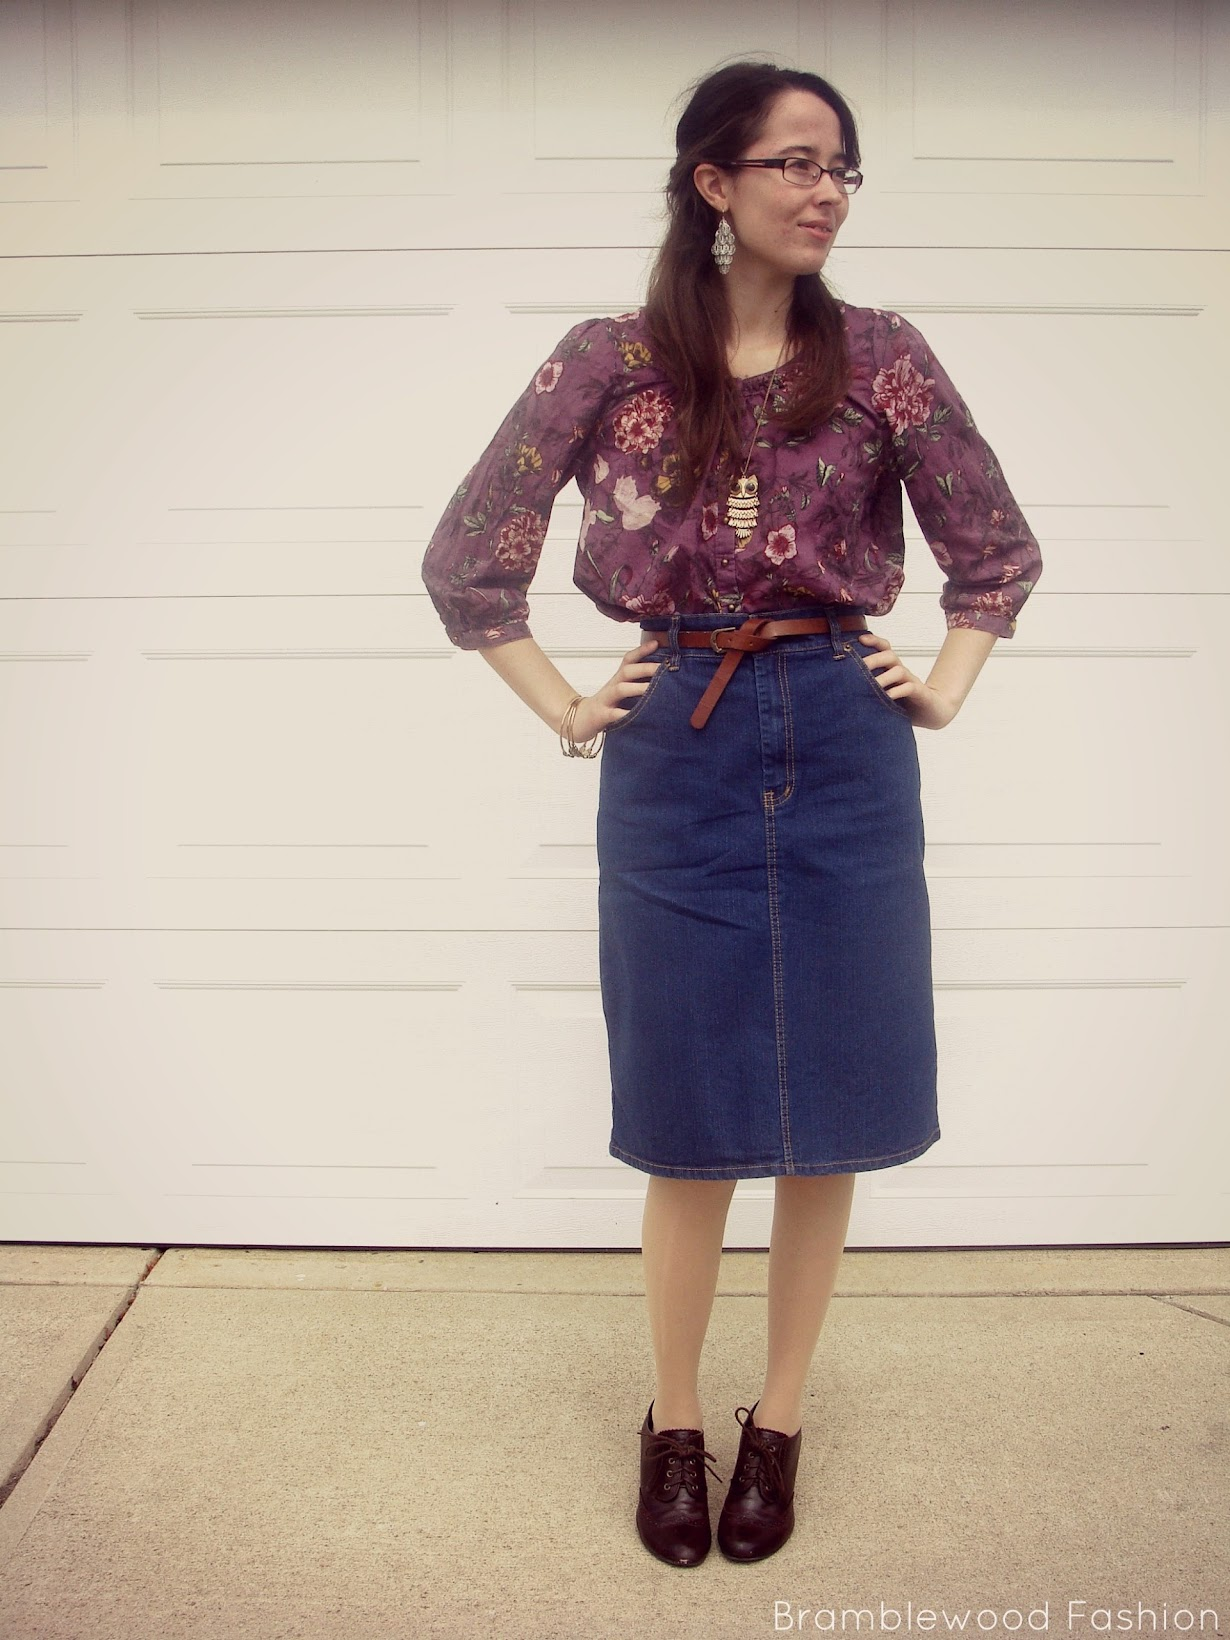 88a173636571 Bramblewood Fashion   Modest Fashion & Beauty Blog: What I Wore   I ...